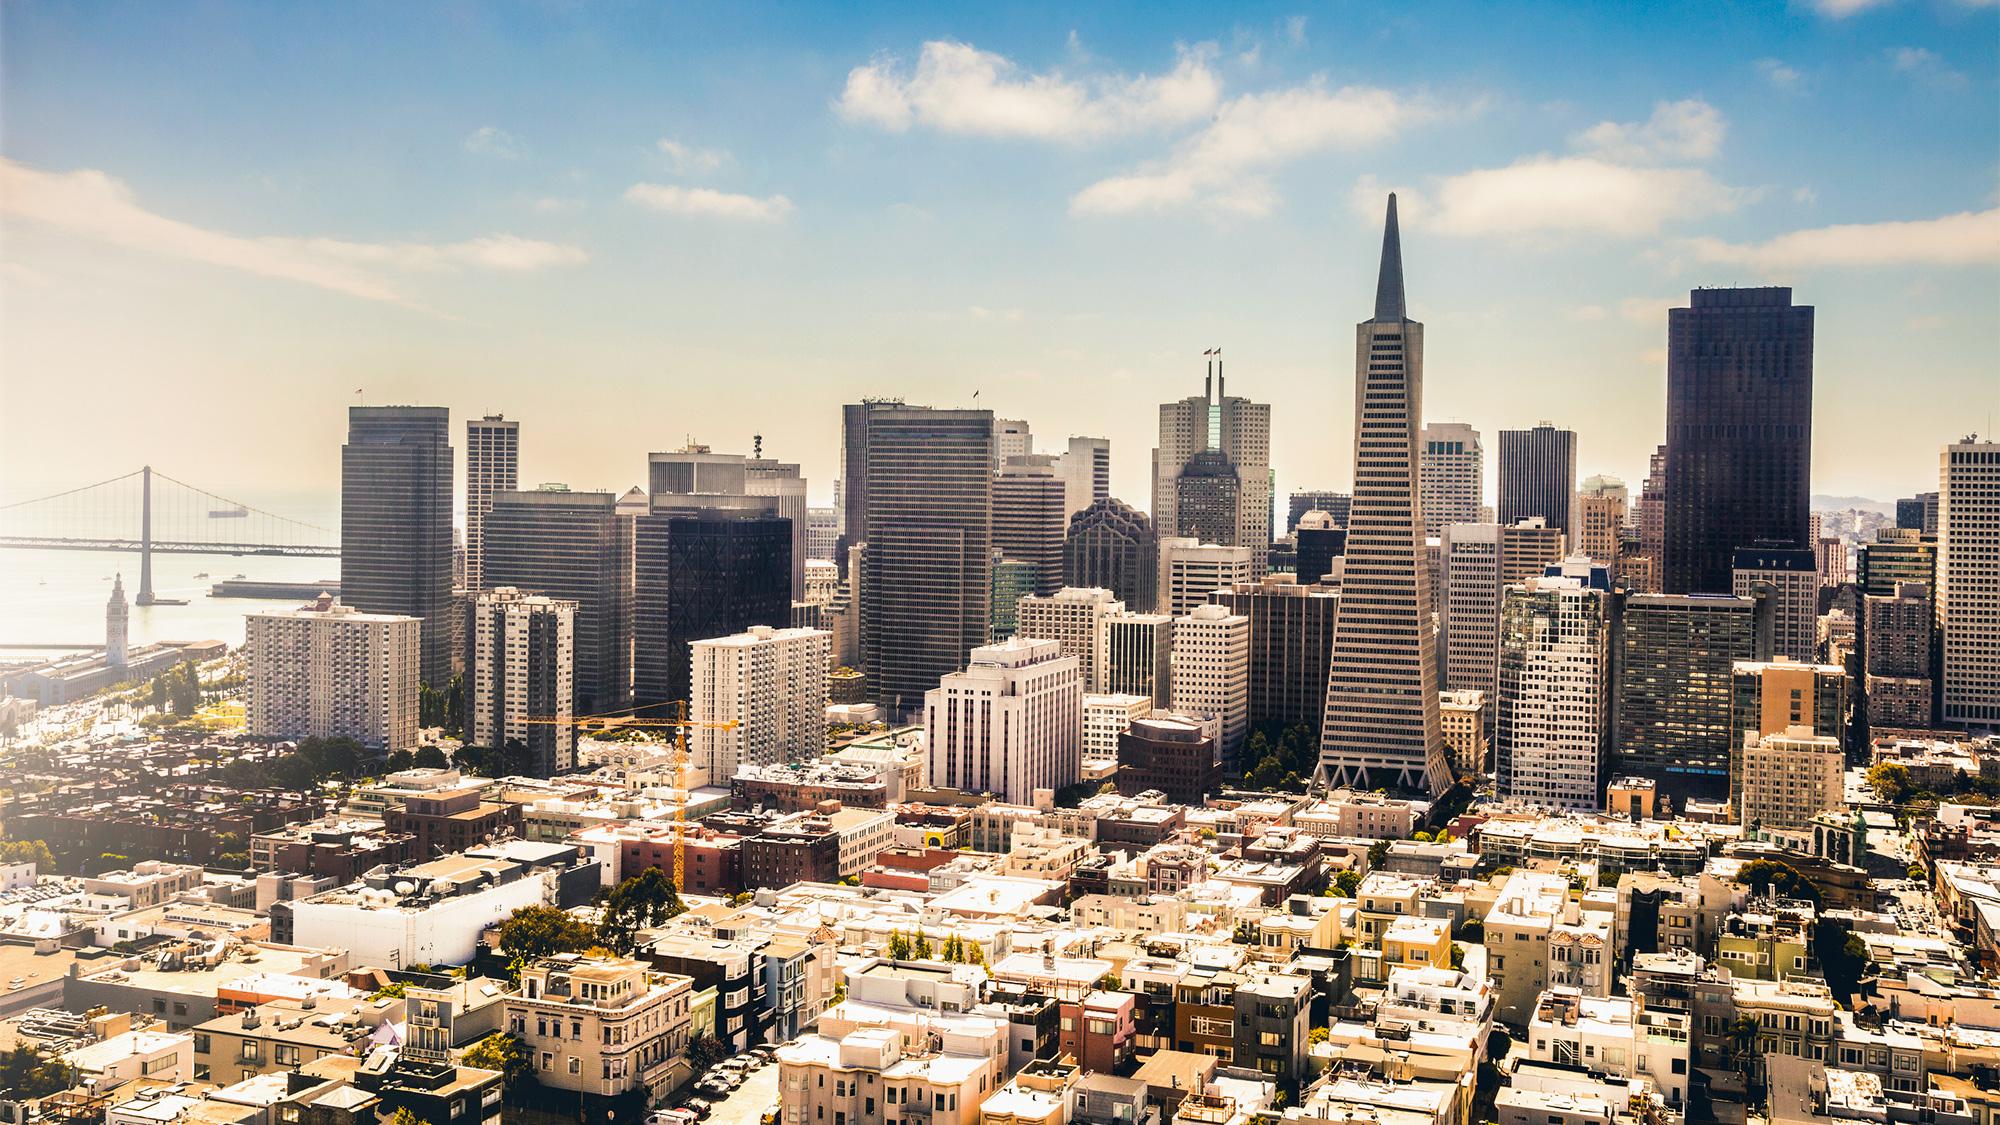 0ef07 san francisco hottest market dec 15 The Hottest U.S. Housing Markets in December 2015